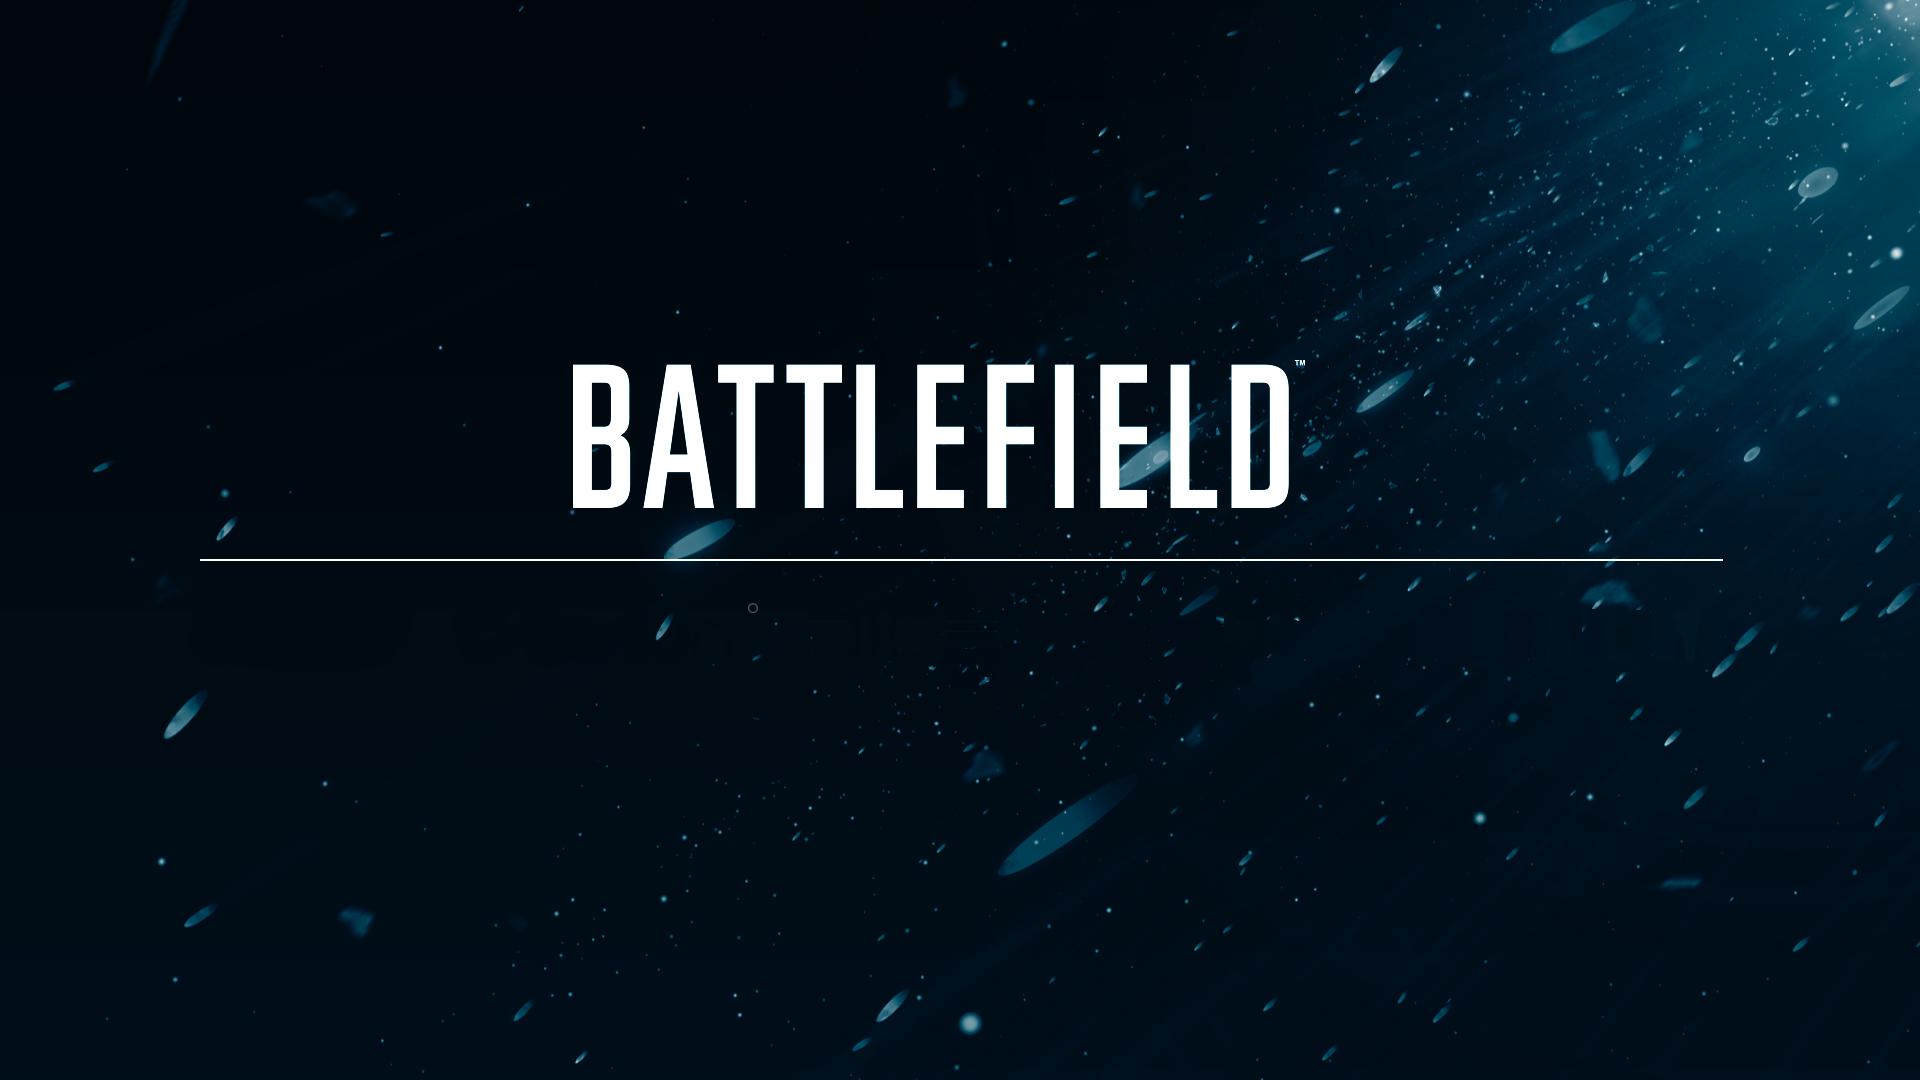 Logo Battlefield 6